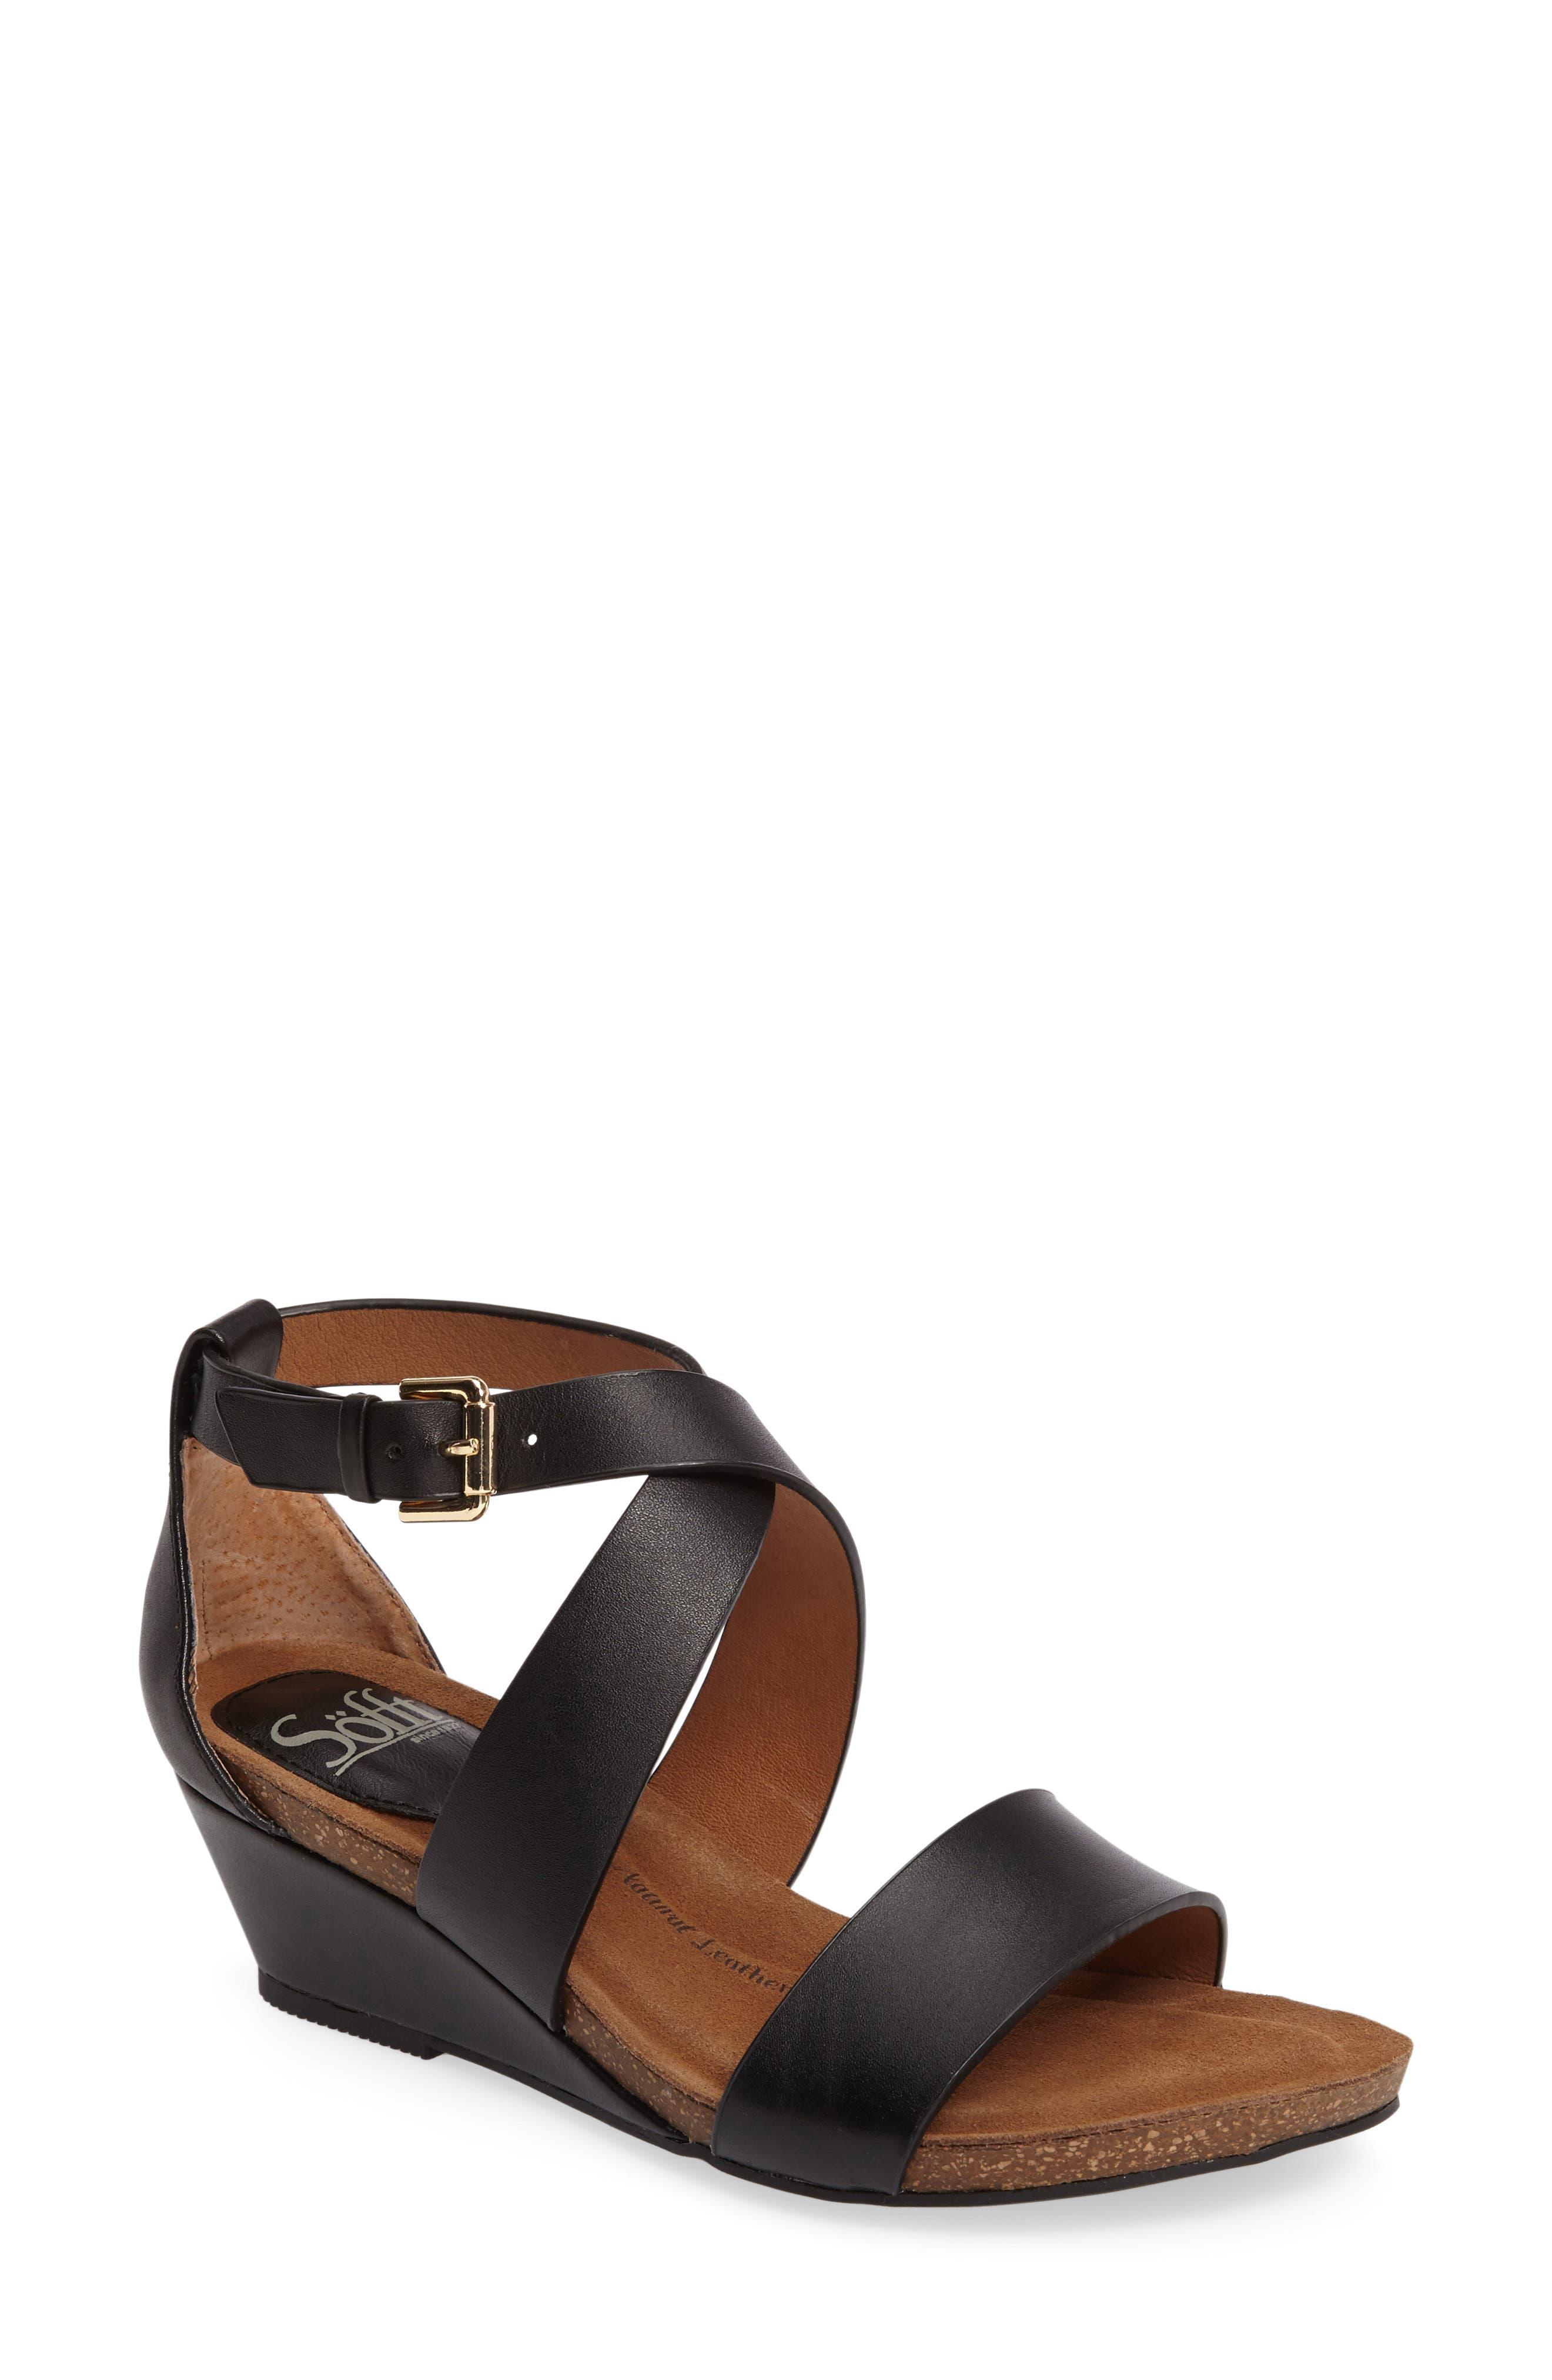 Vita Strappy Wedge Sandal,                         Main,                         color,